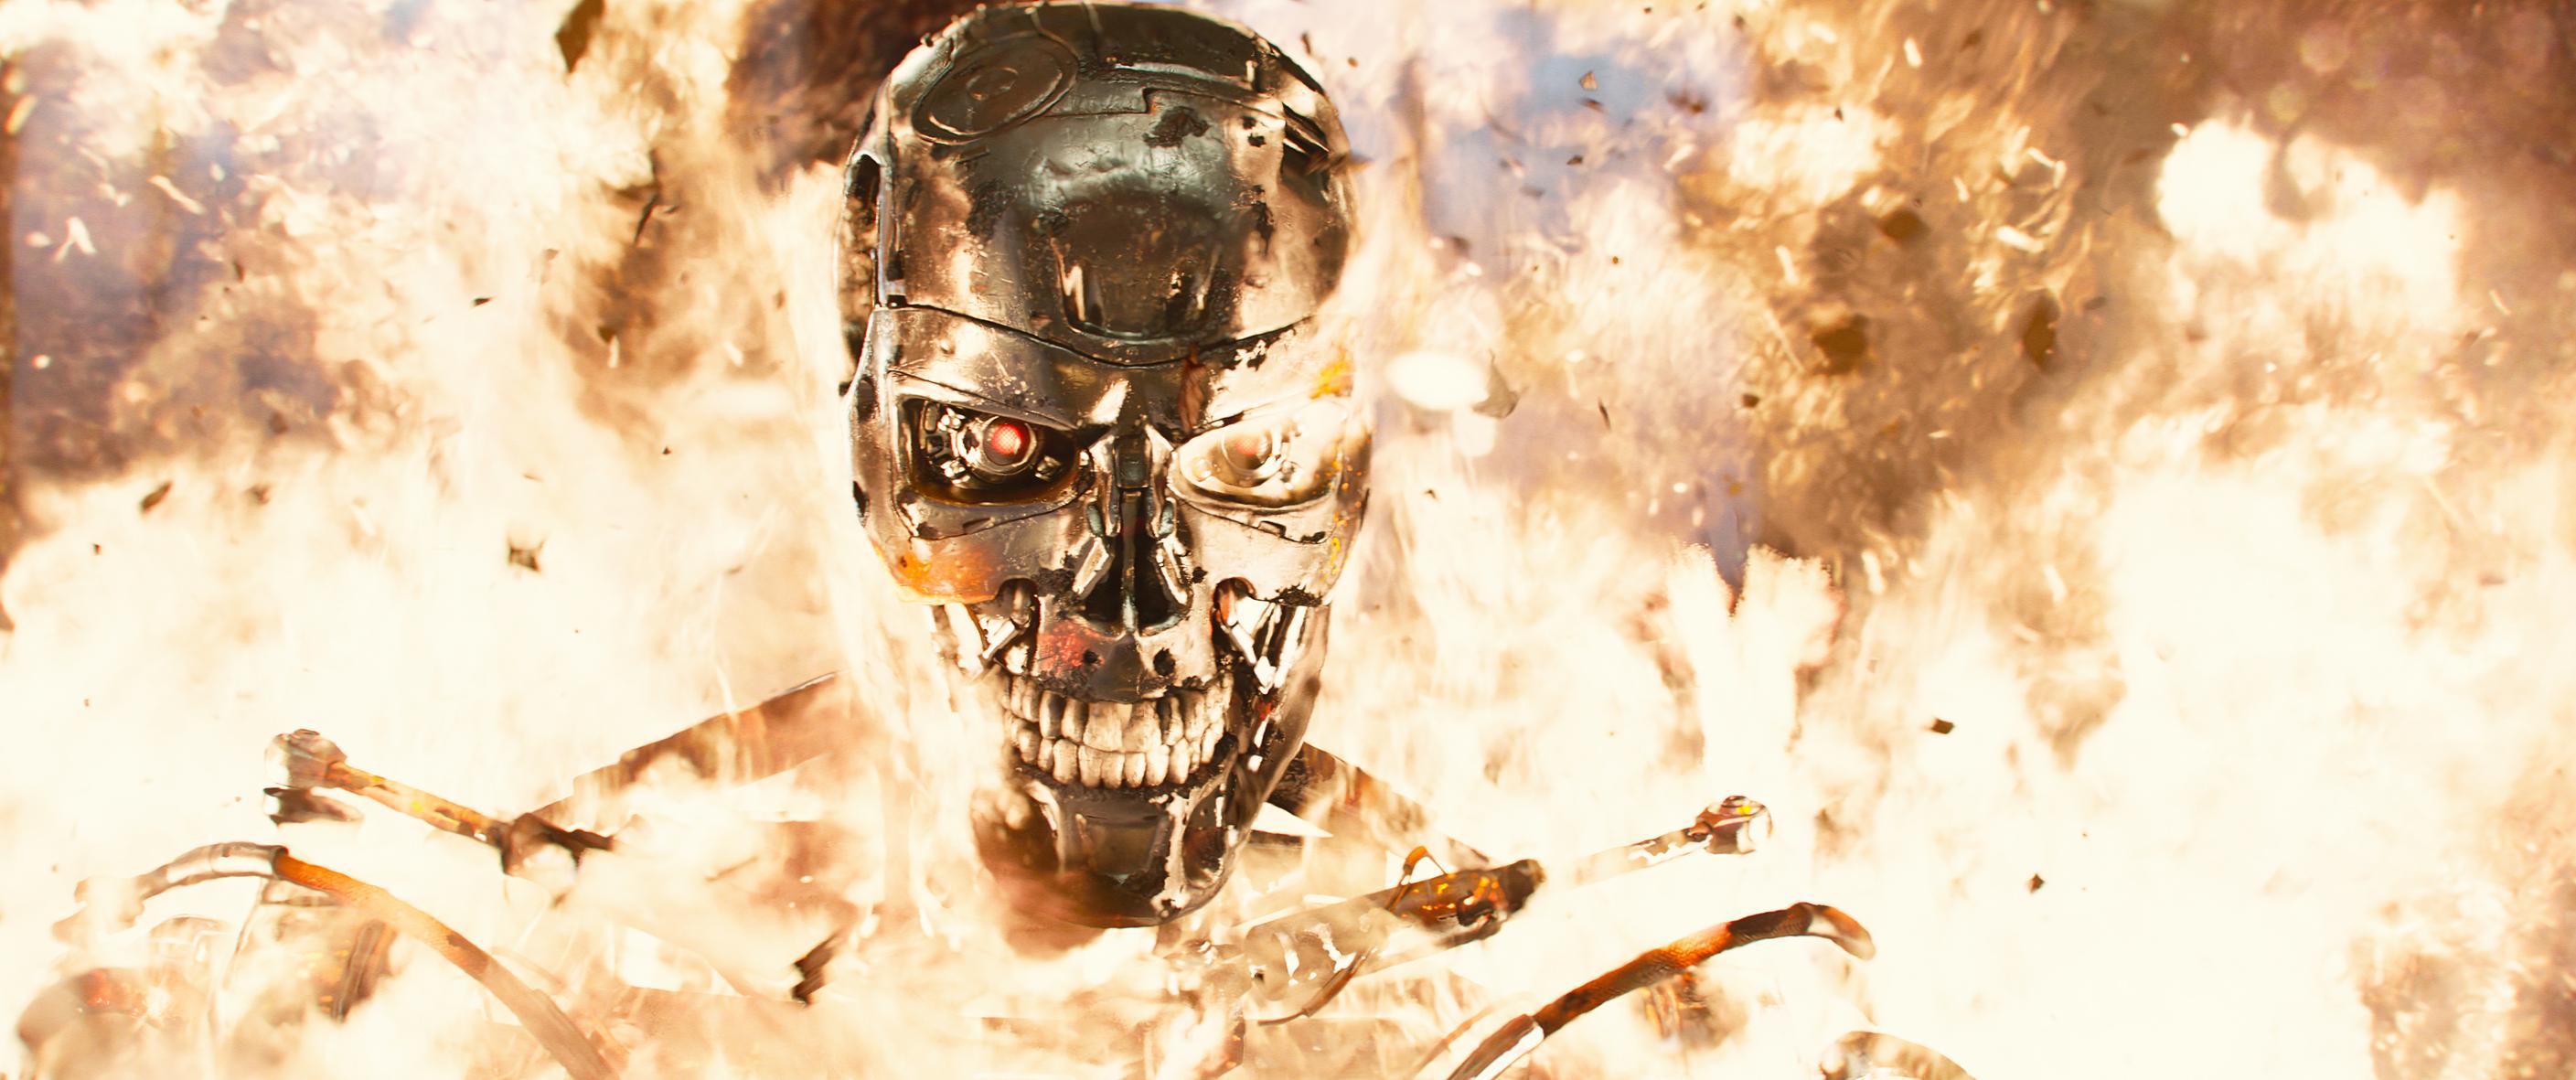 Terminator-Genisys-4K-UHD-Blu-ray-Szene-4.jpg